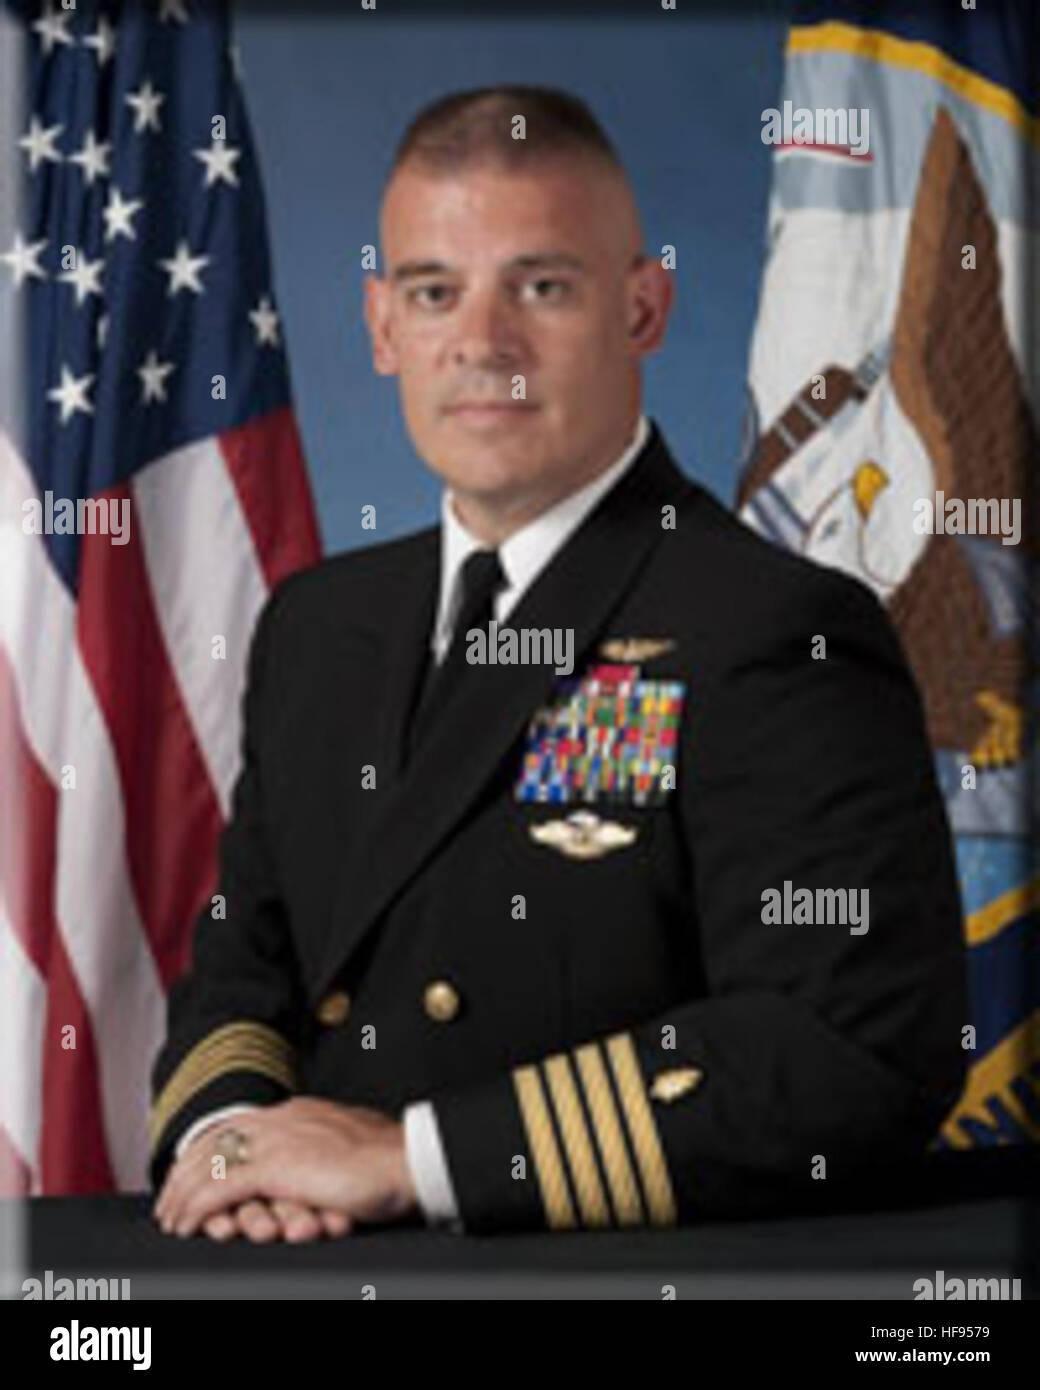 Executive Officer CAPT James L. Hancock Stock Photo: 129894109 - Alamy